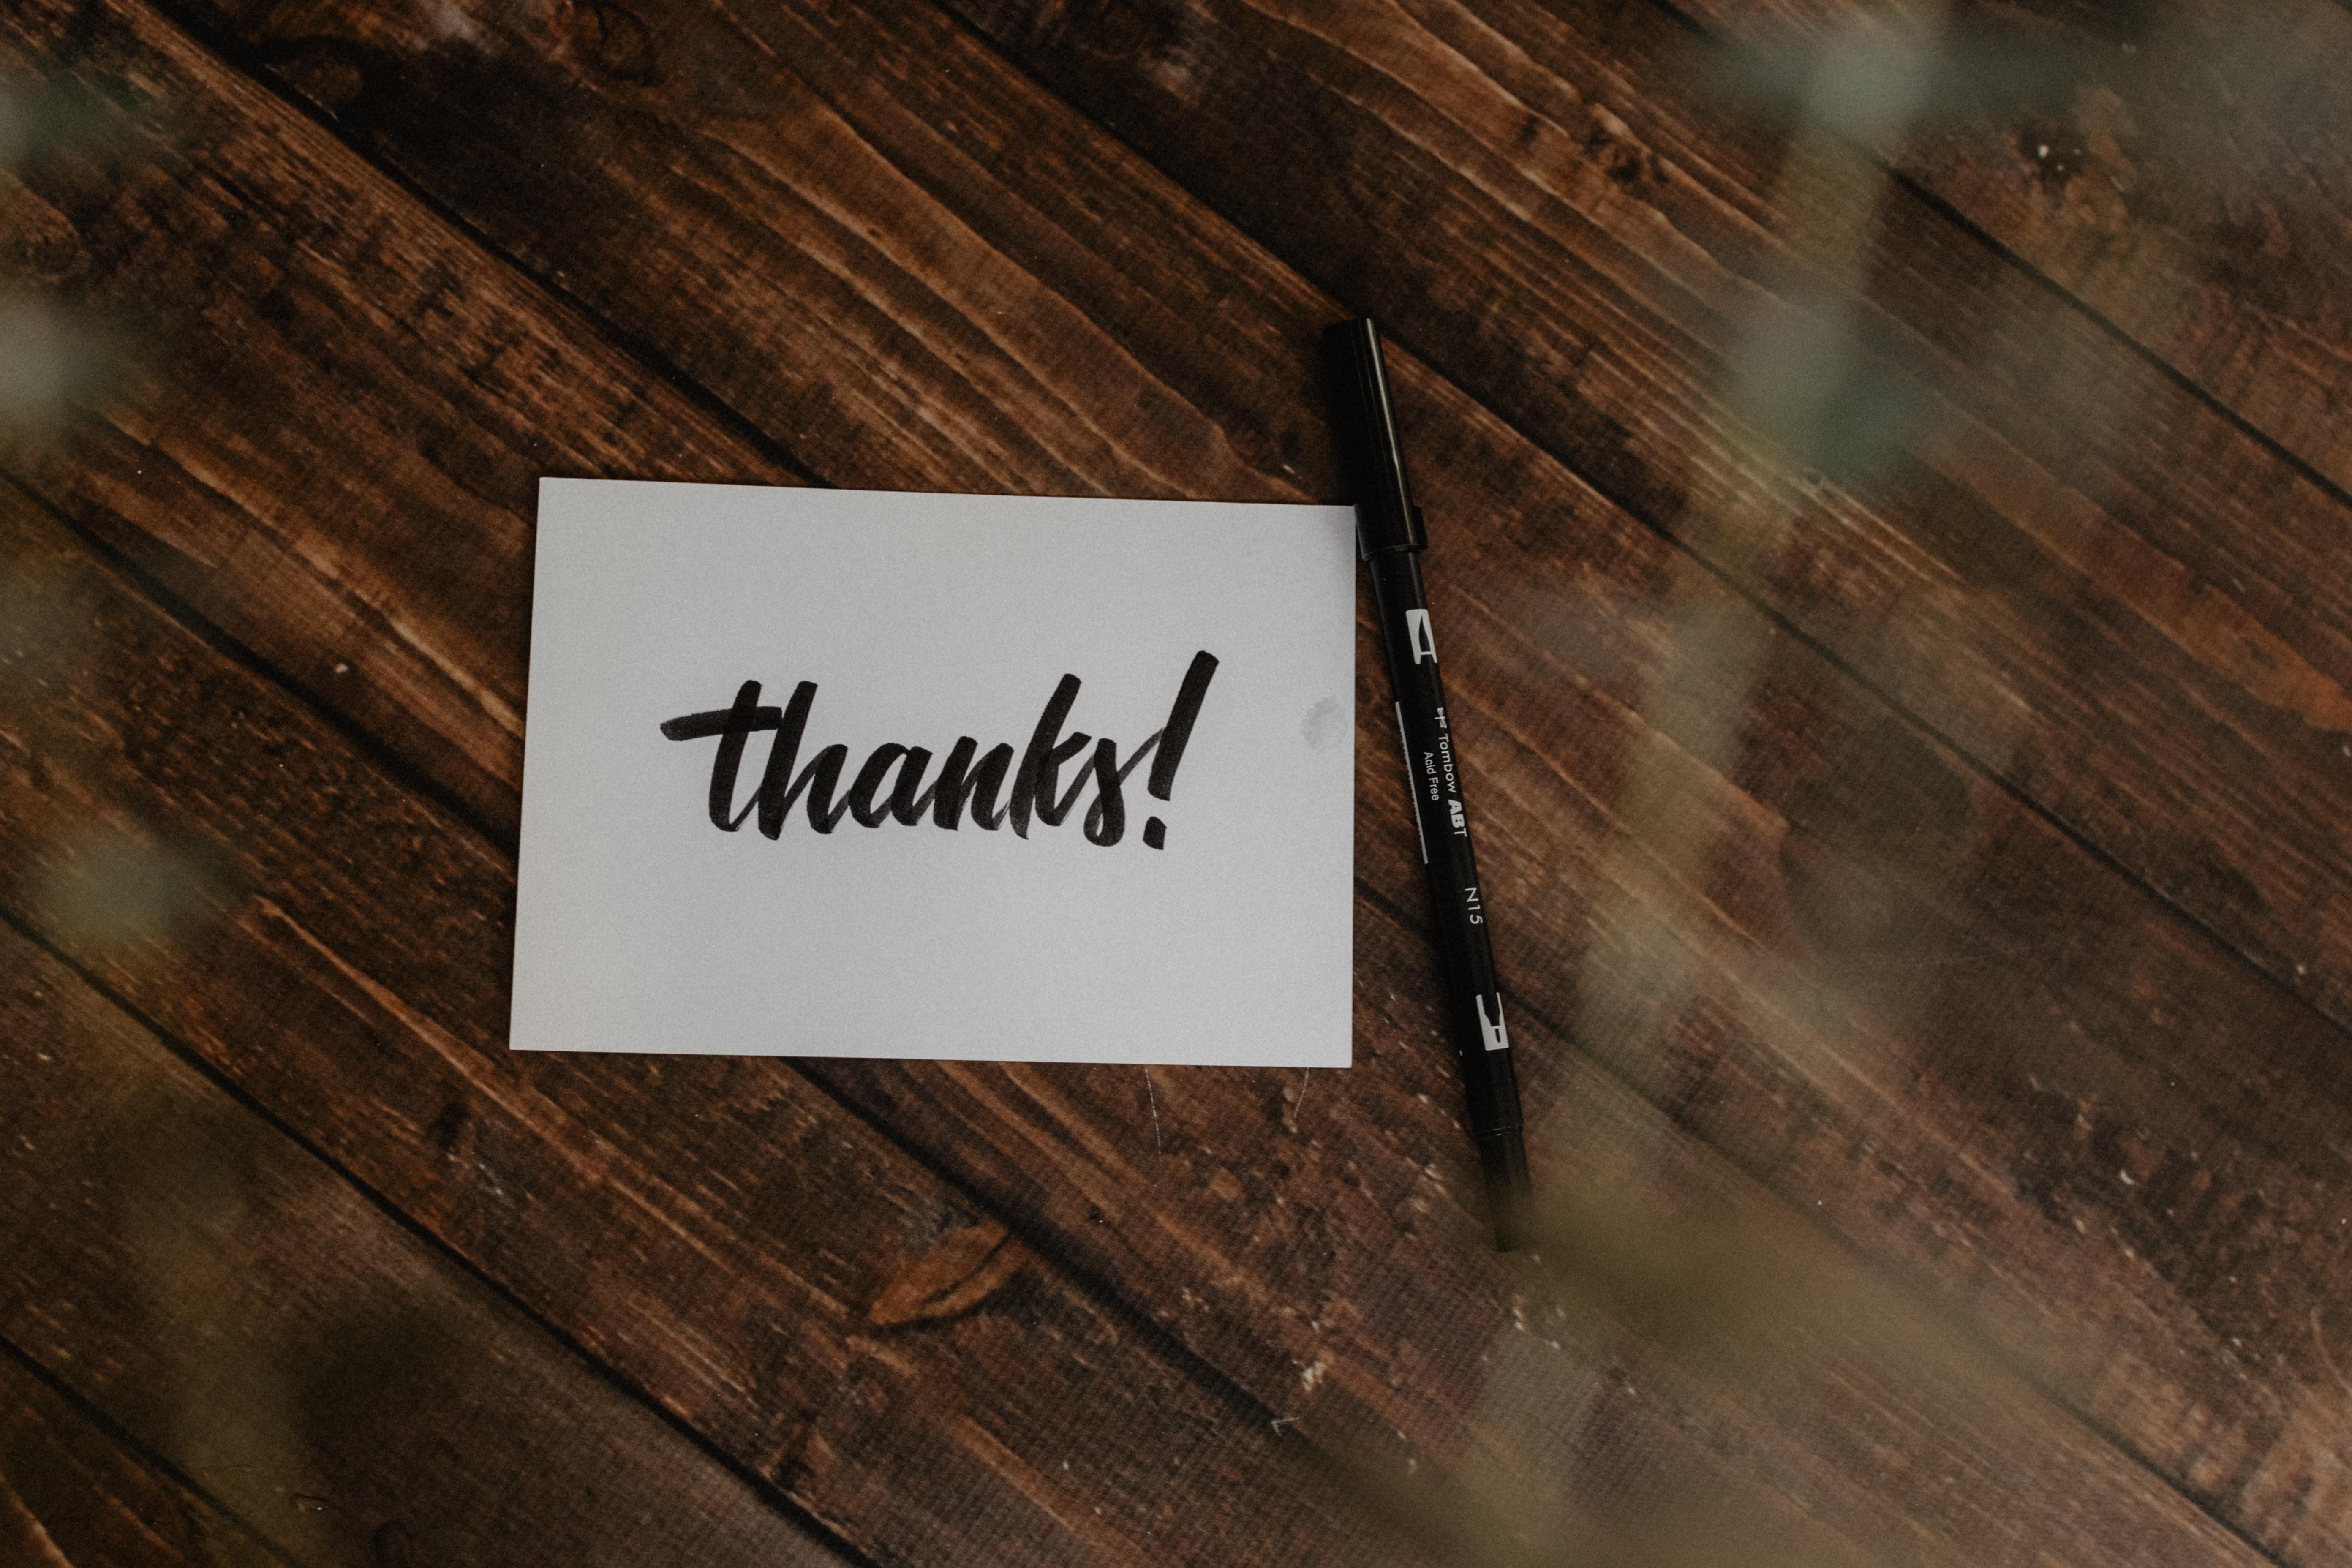 Thankfulness - Practicing Gratitude